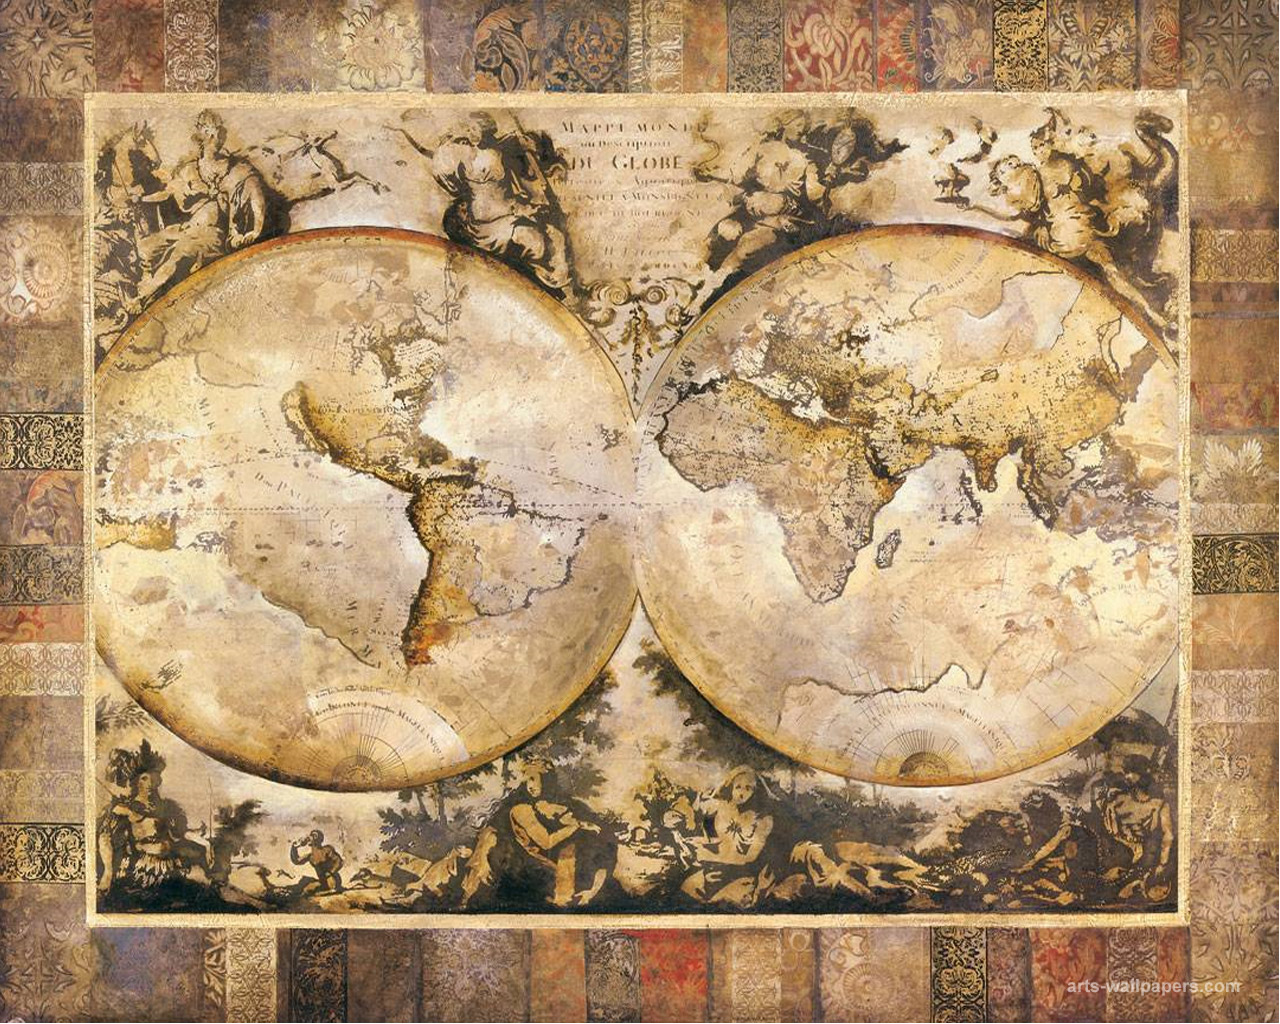 Vintage map wallpaper wallpapersafari fotos antique map wallpaper 1280x1024 gumiabroncs Gallery